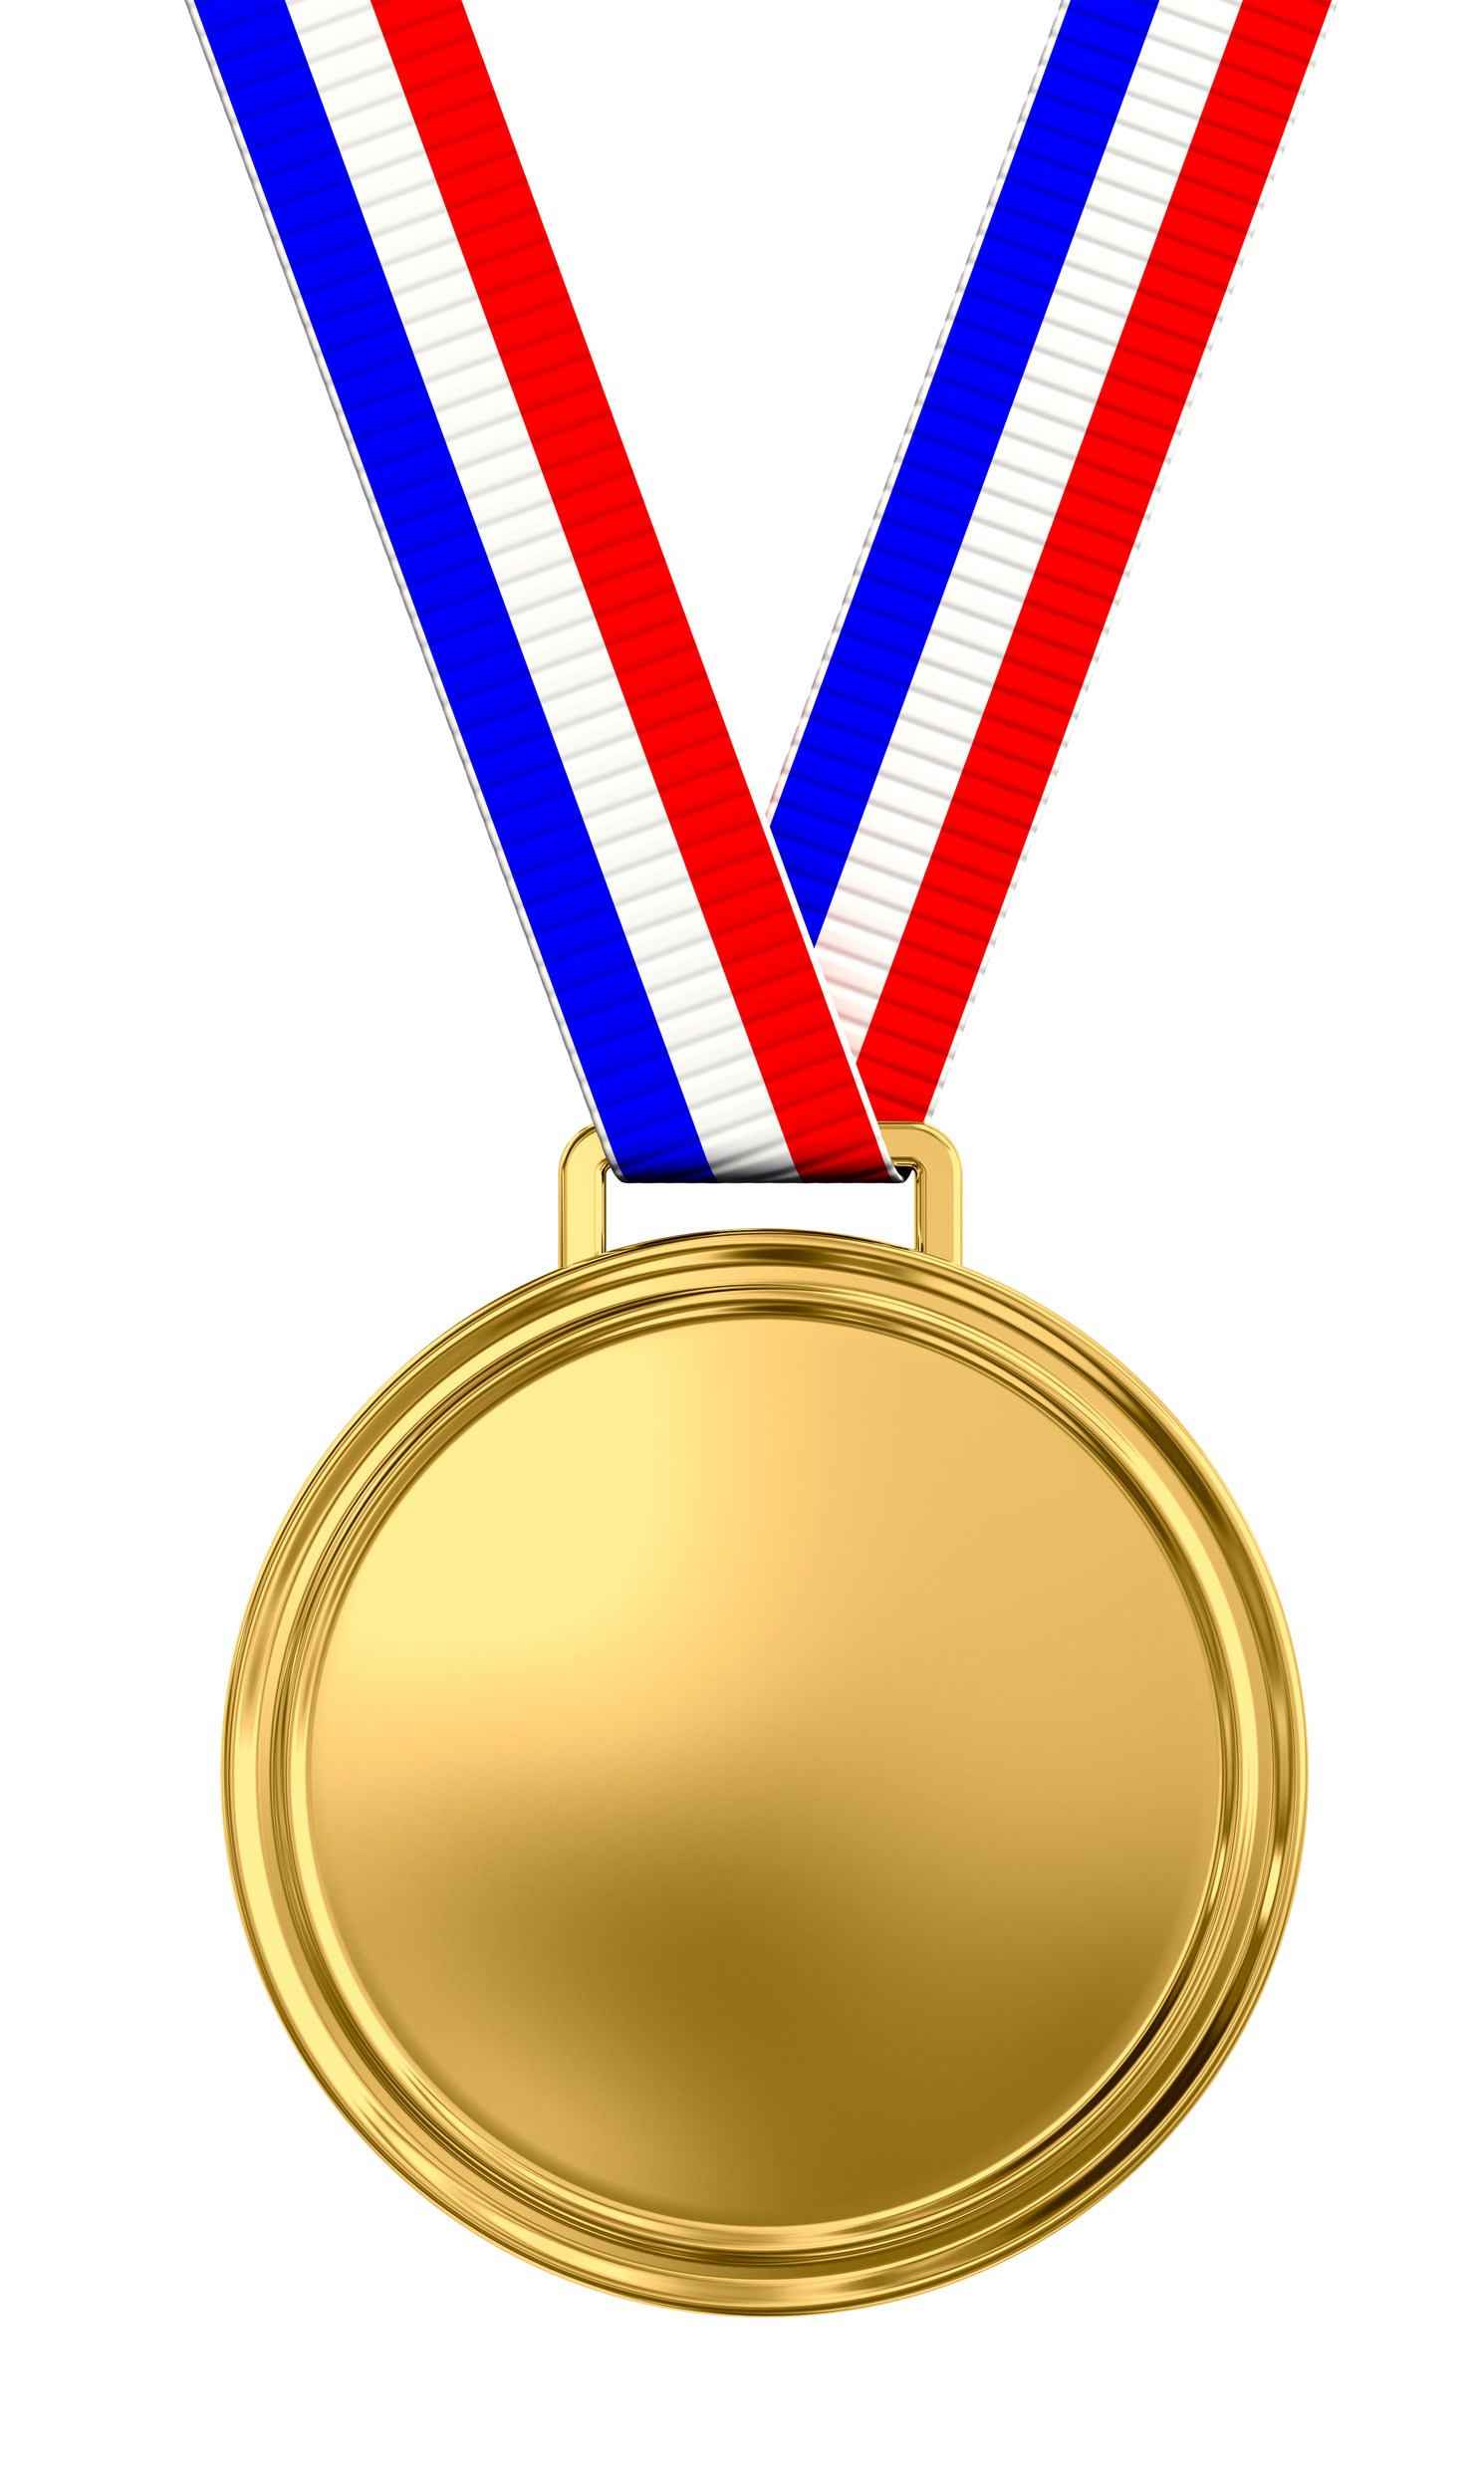 Medal clipart. Gold timmins ringette association